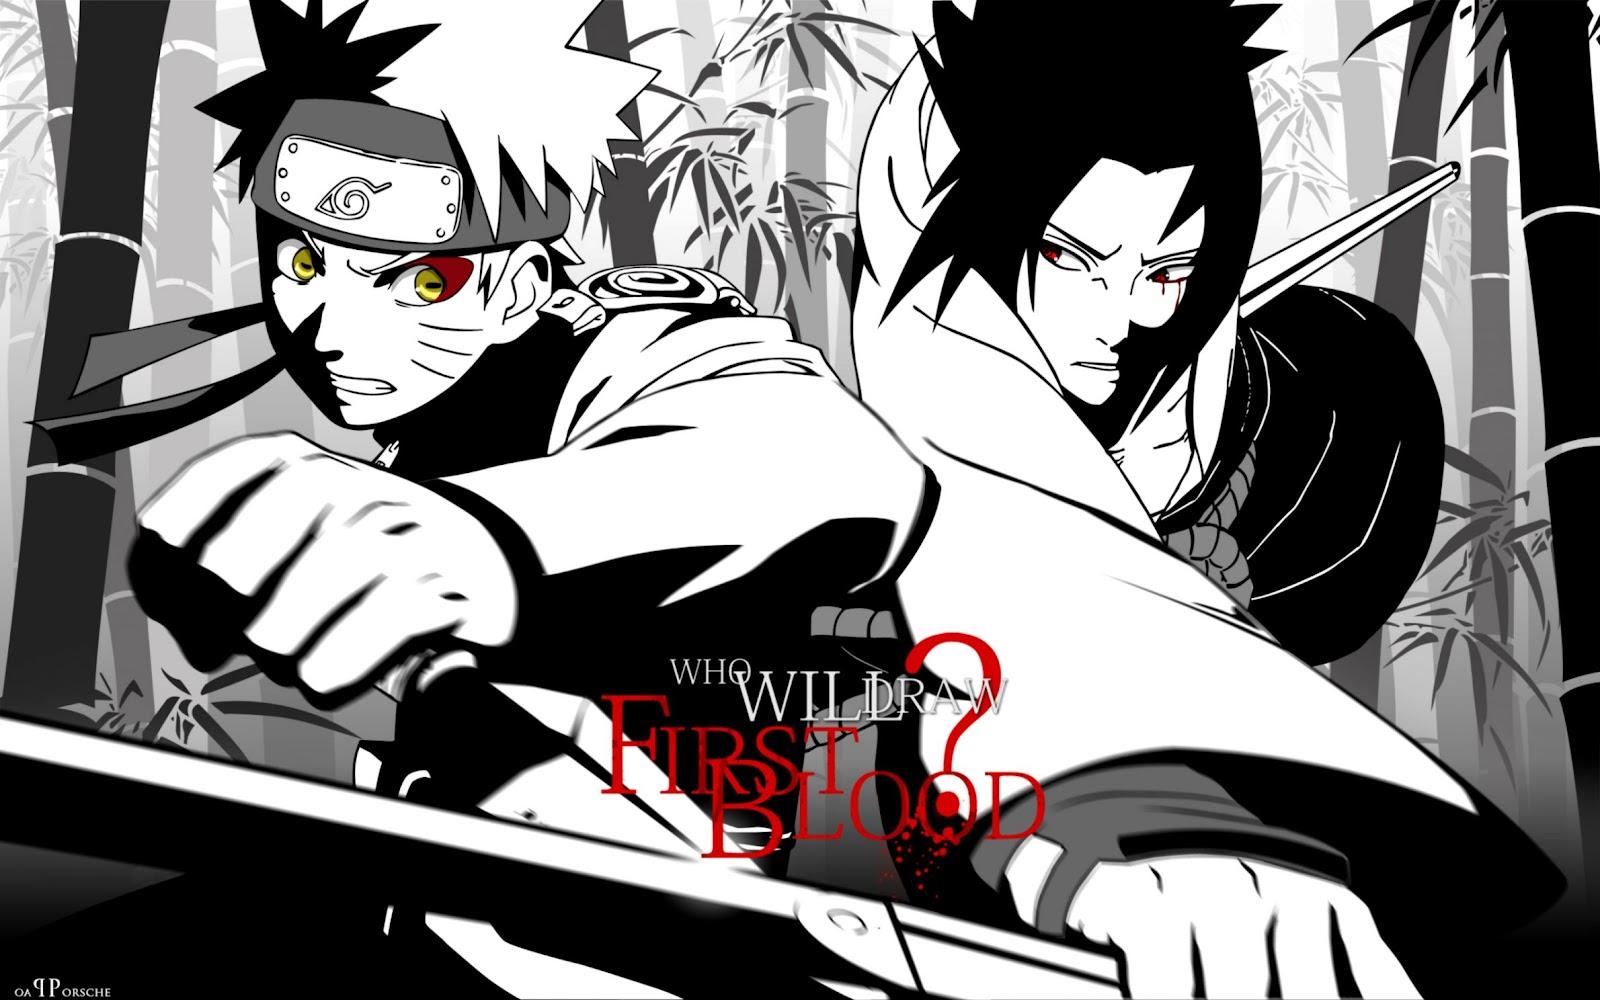 Wallpaper Hd 1080p Black And White Naruto Sasuke Wallpapers Quality,Tumbleweed Tiny Homes Owner